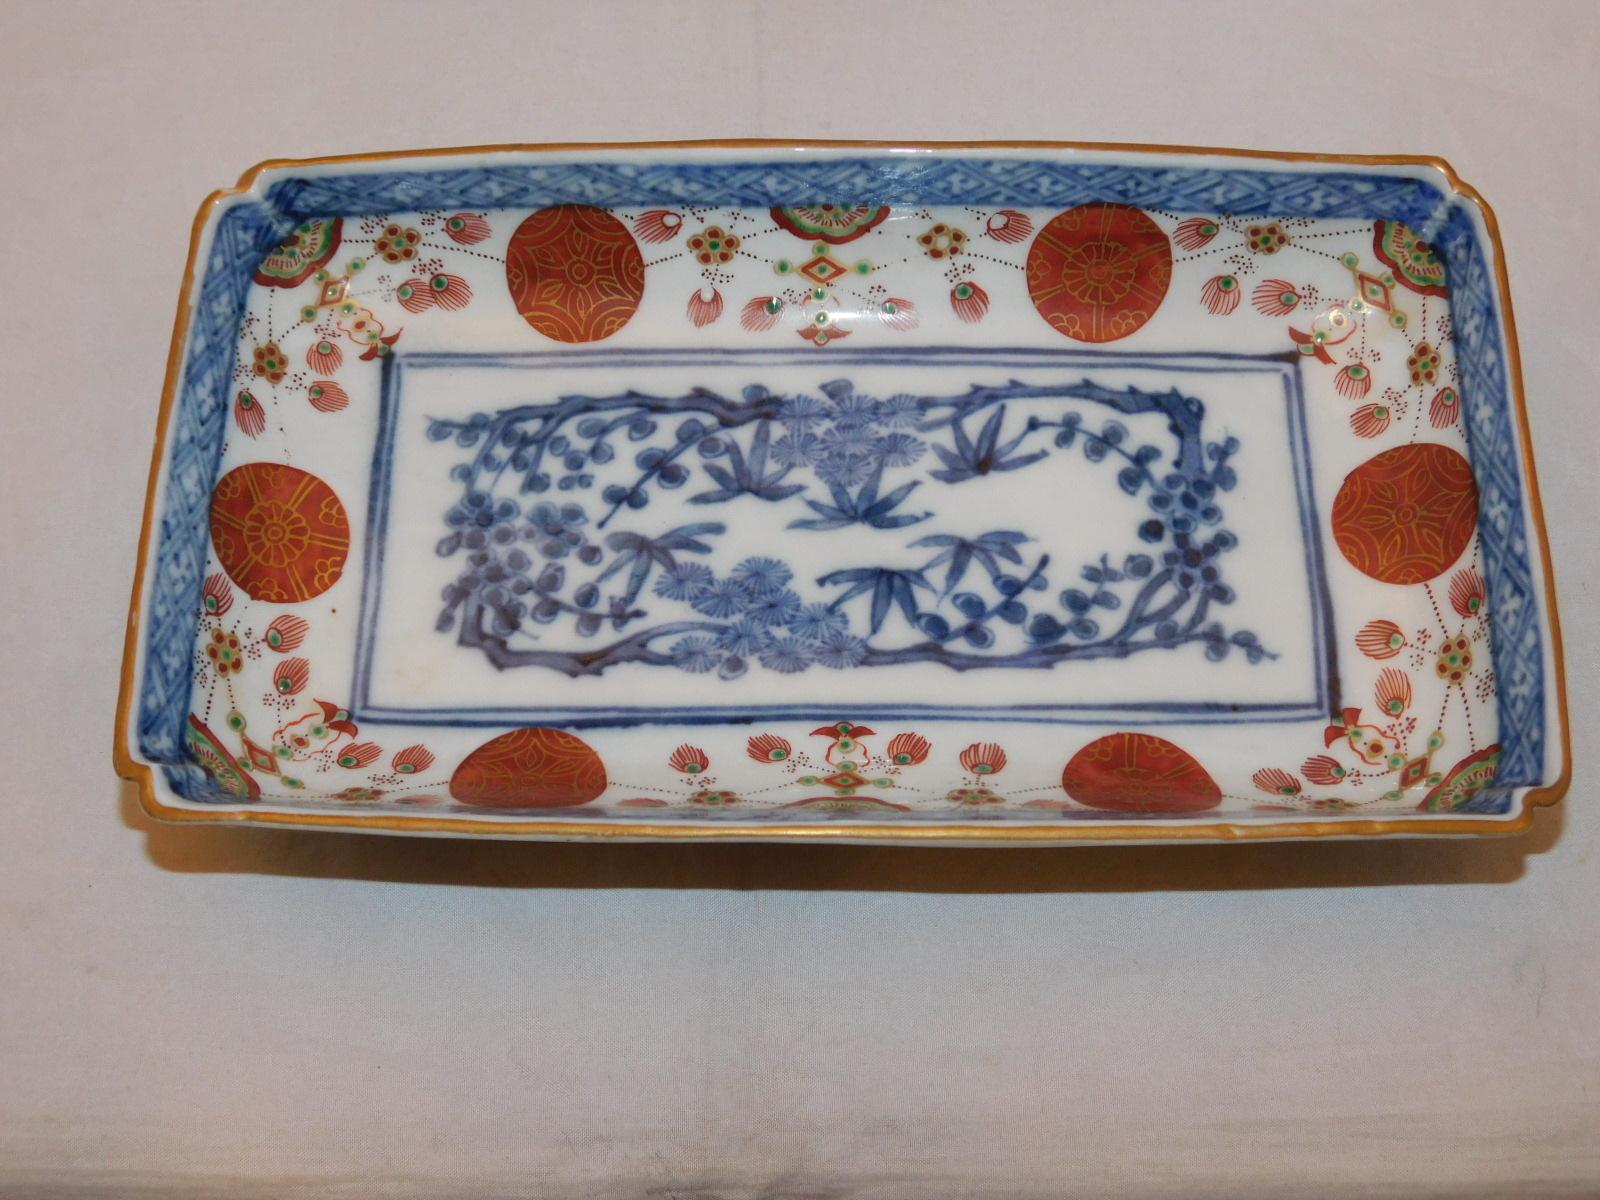 伊万里色絵長角皿 Imari porcelain plate